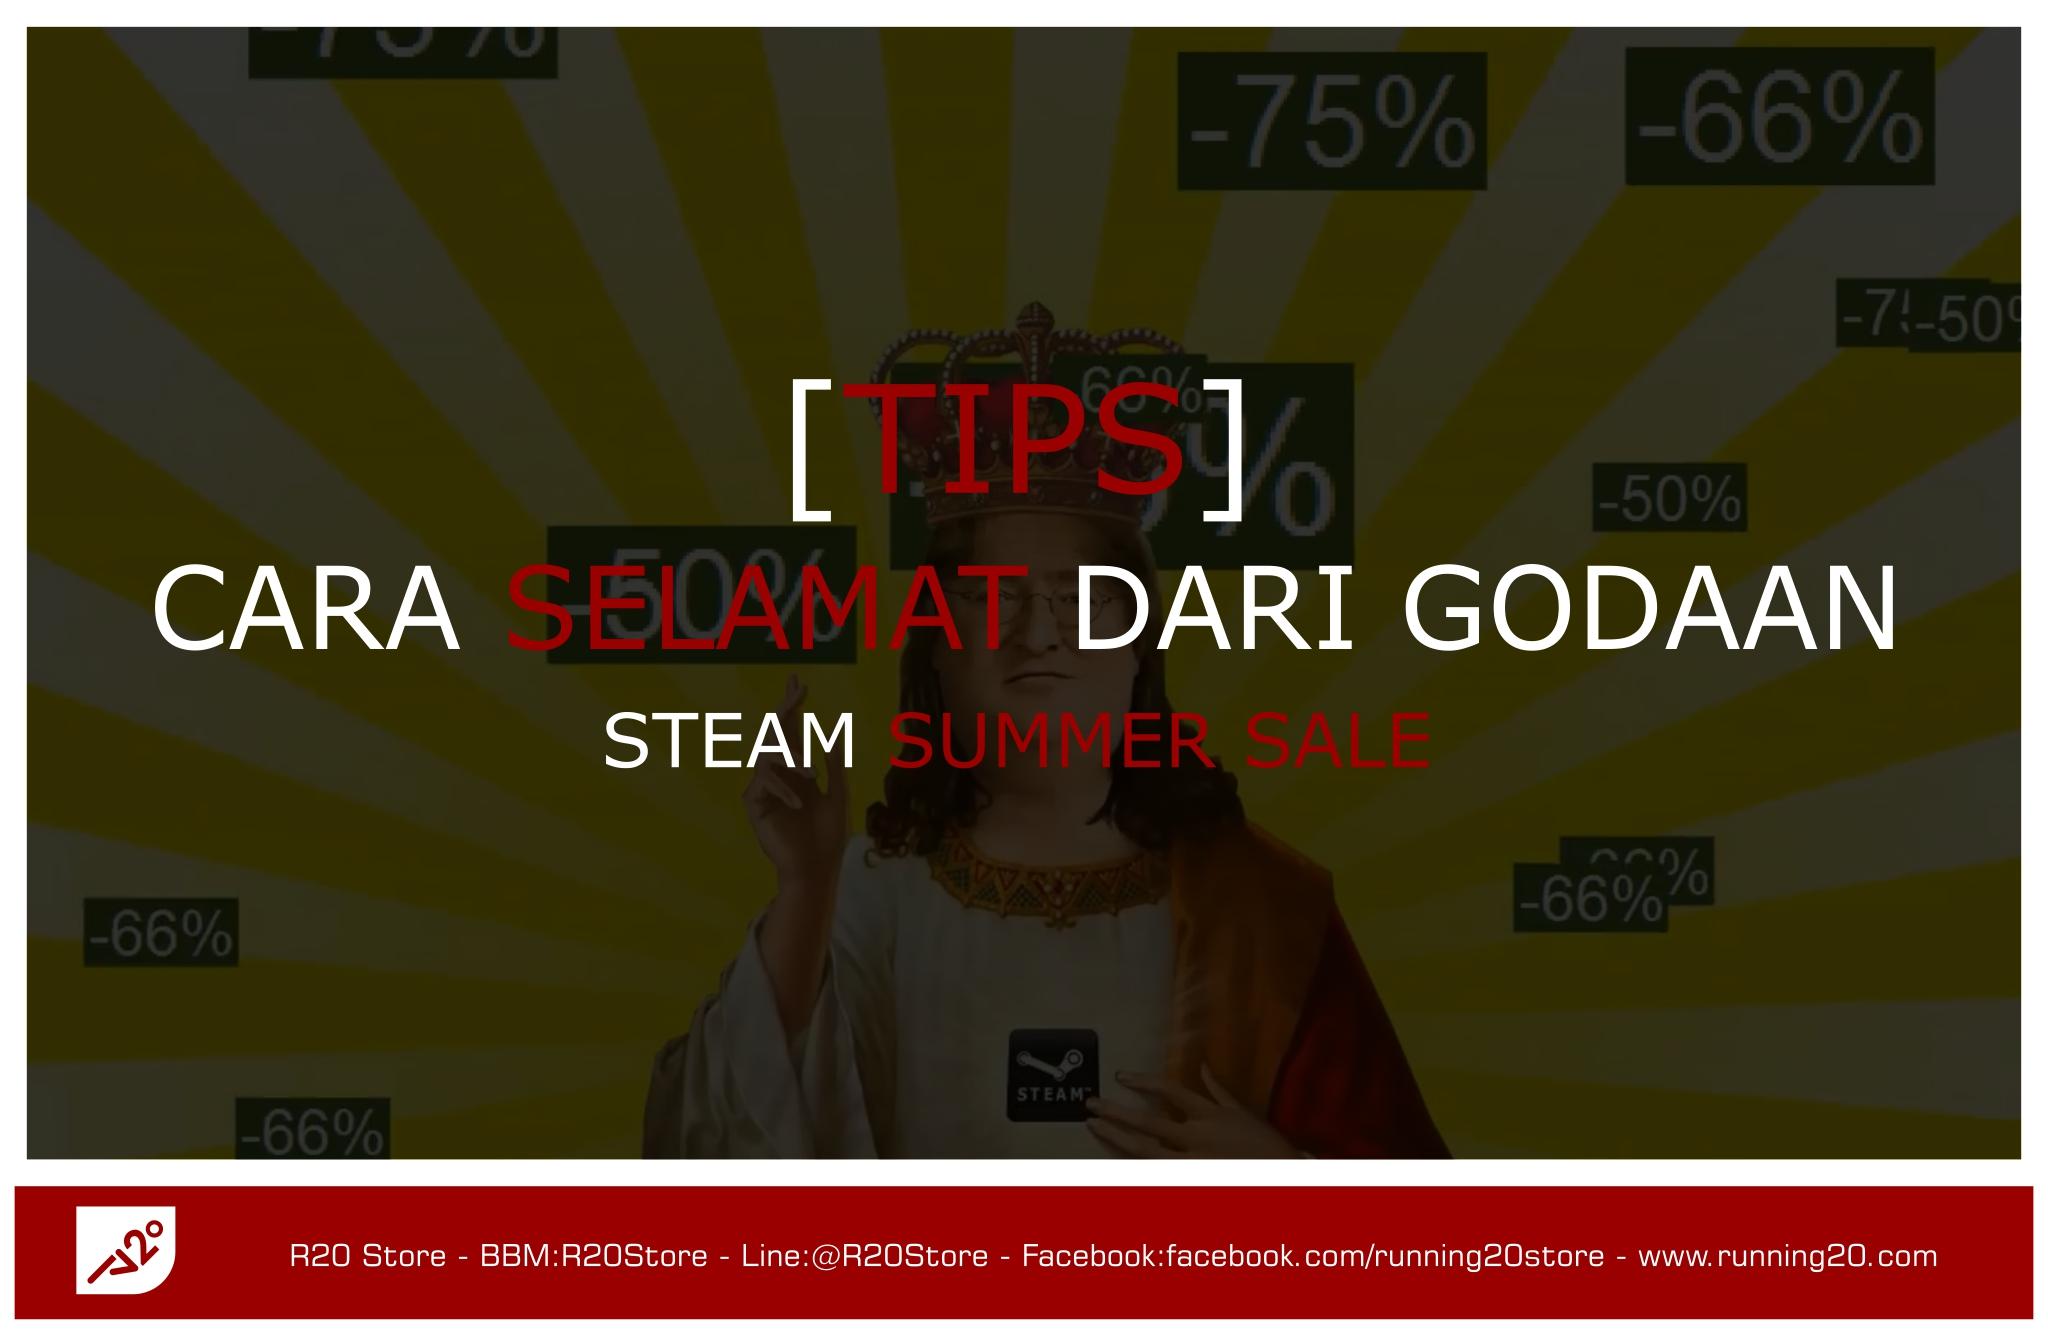 [Tips] Cara Selamat dari Godaan Steam Summer Sale